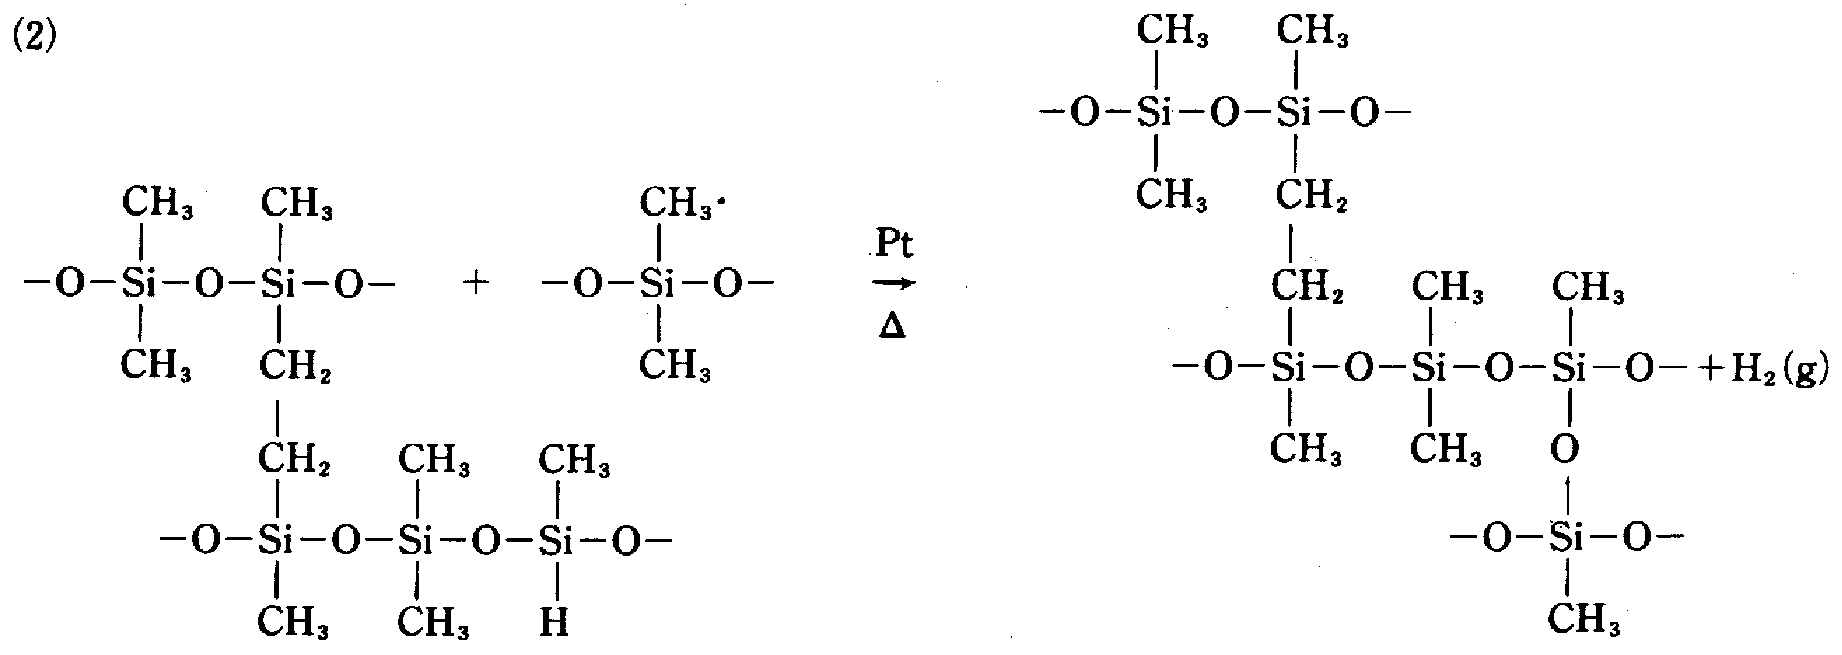 Figure kpo00004